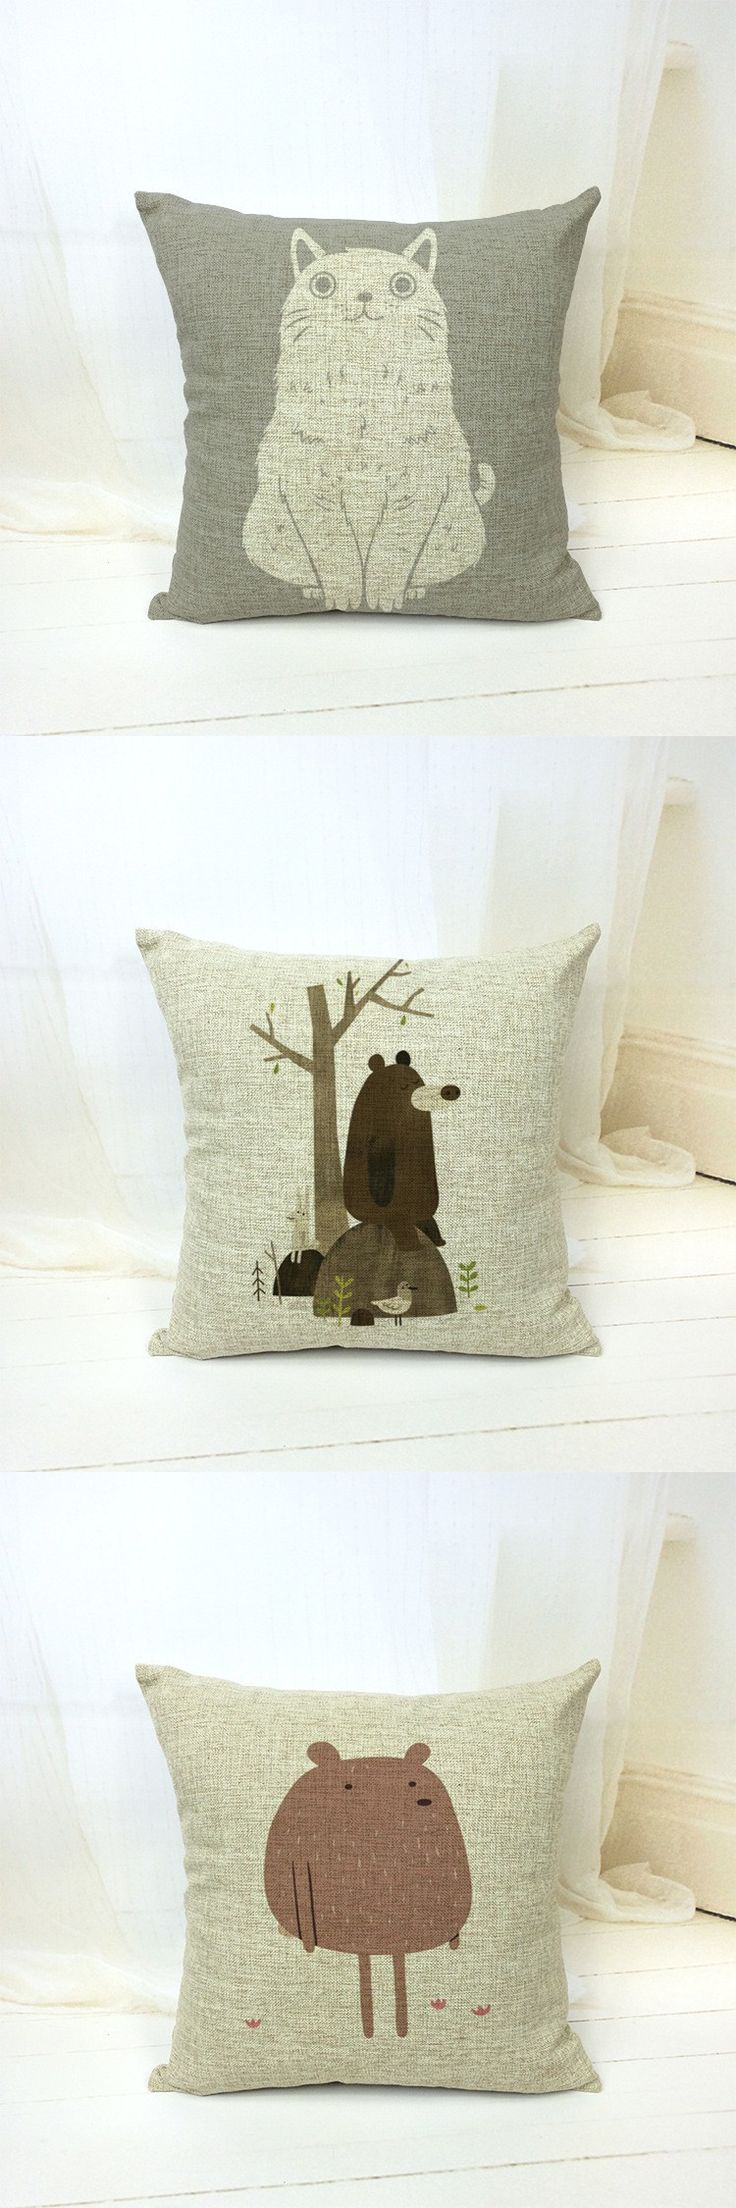 "18"" Design Animal Cat Decorative Pillows Kussens Home Decor Cushions Coussin Cuscini Cojines Pouf Almofadas Scandinavian Futon $9.99"